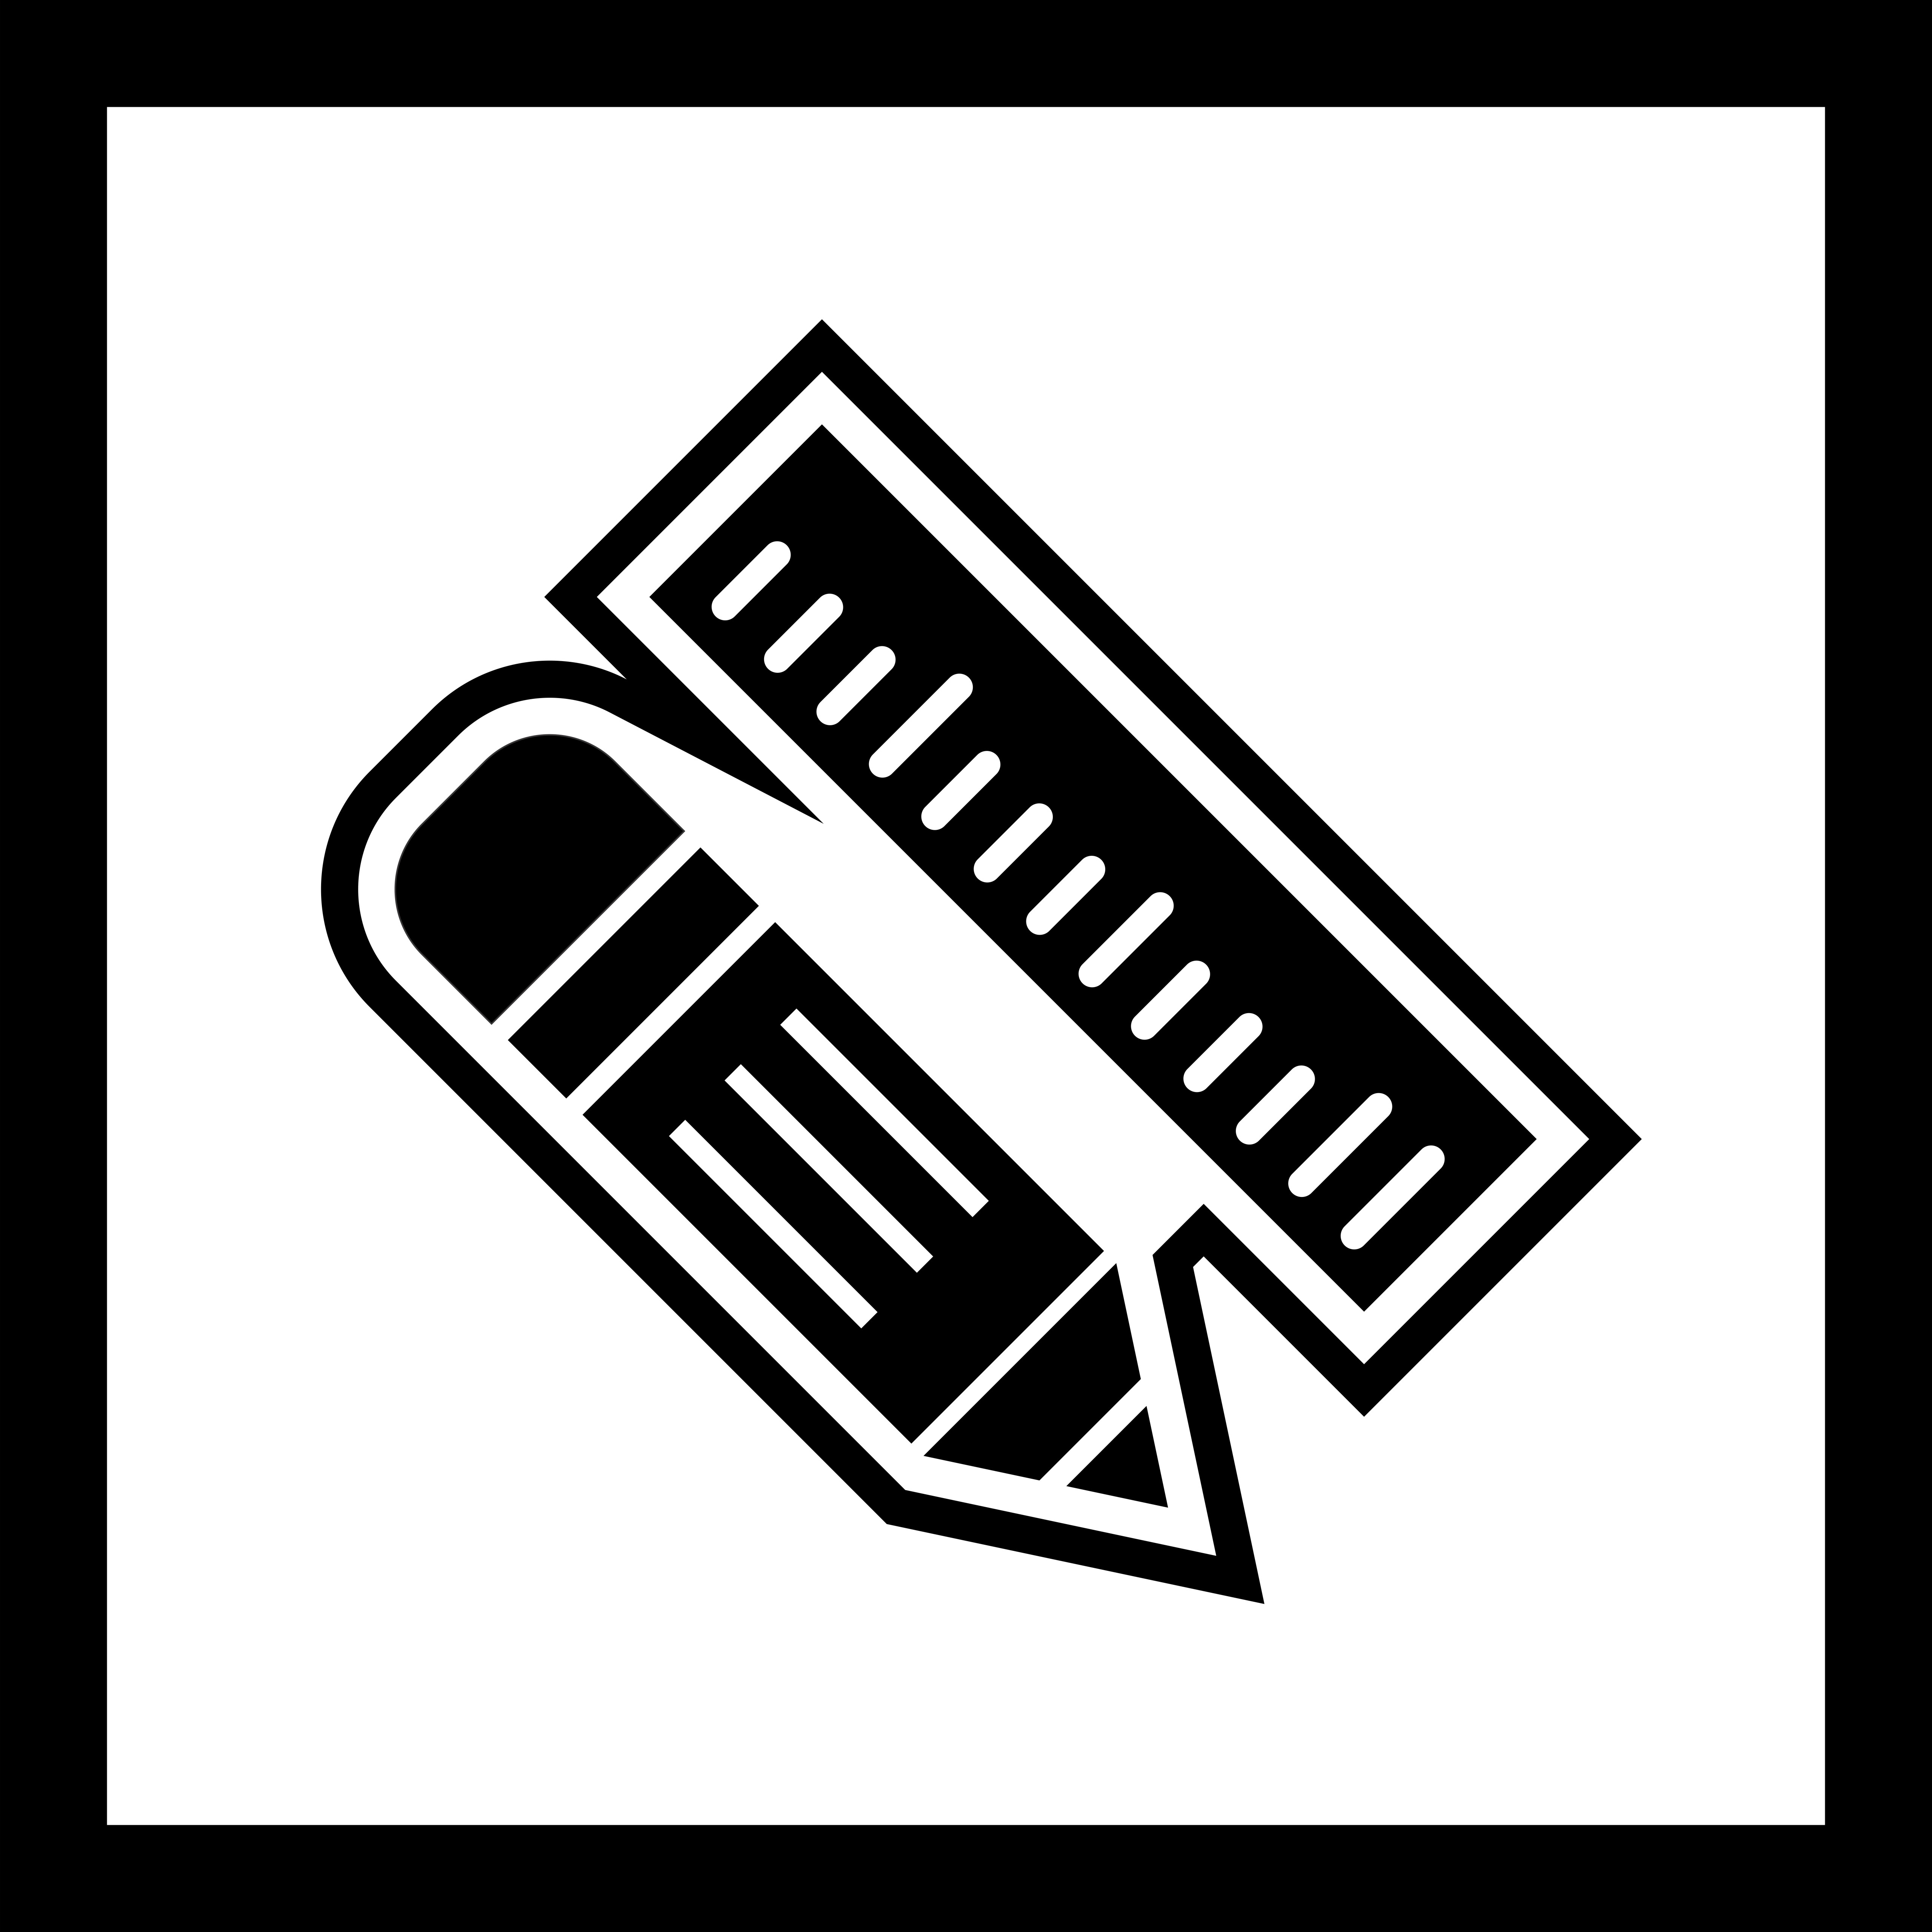 Pencil Amp Ruler Icon Design